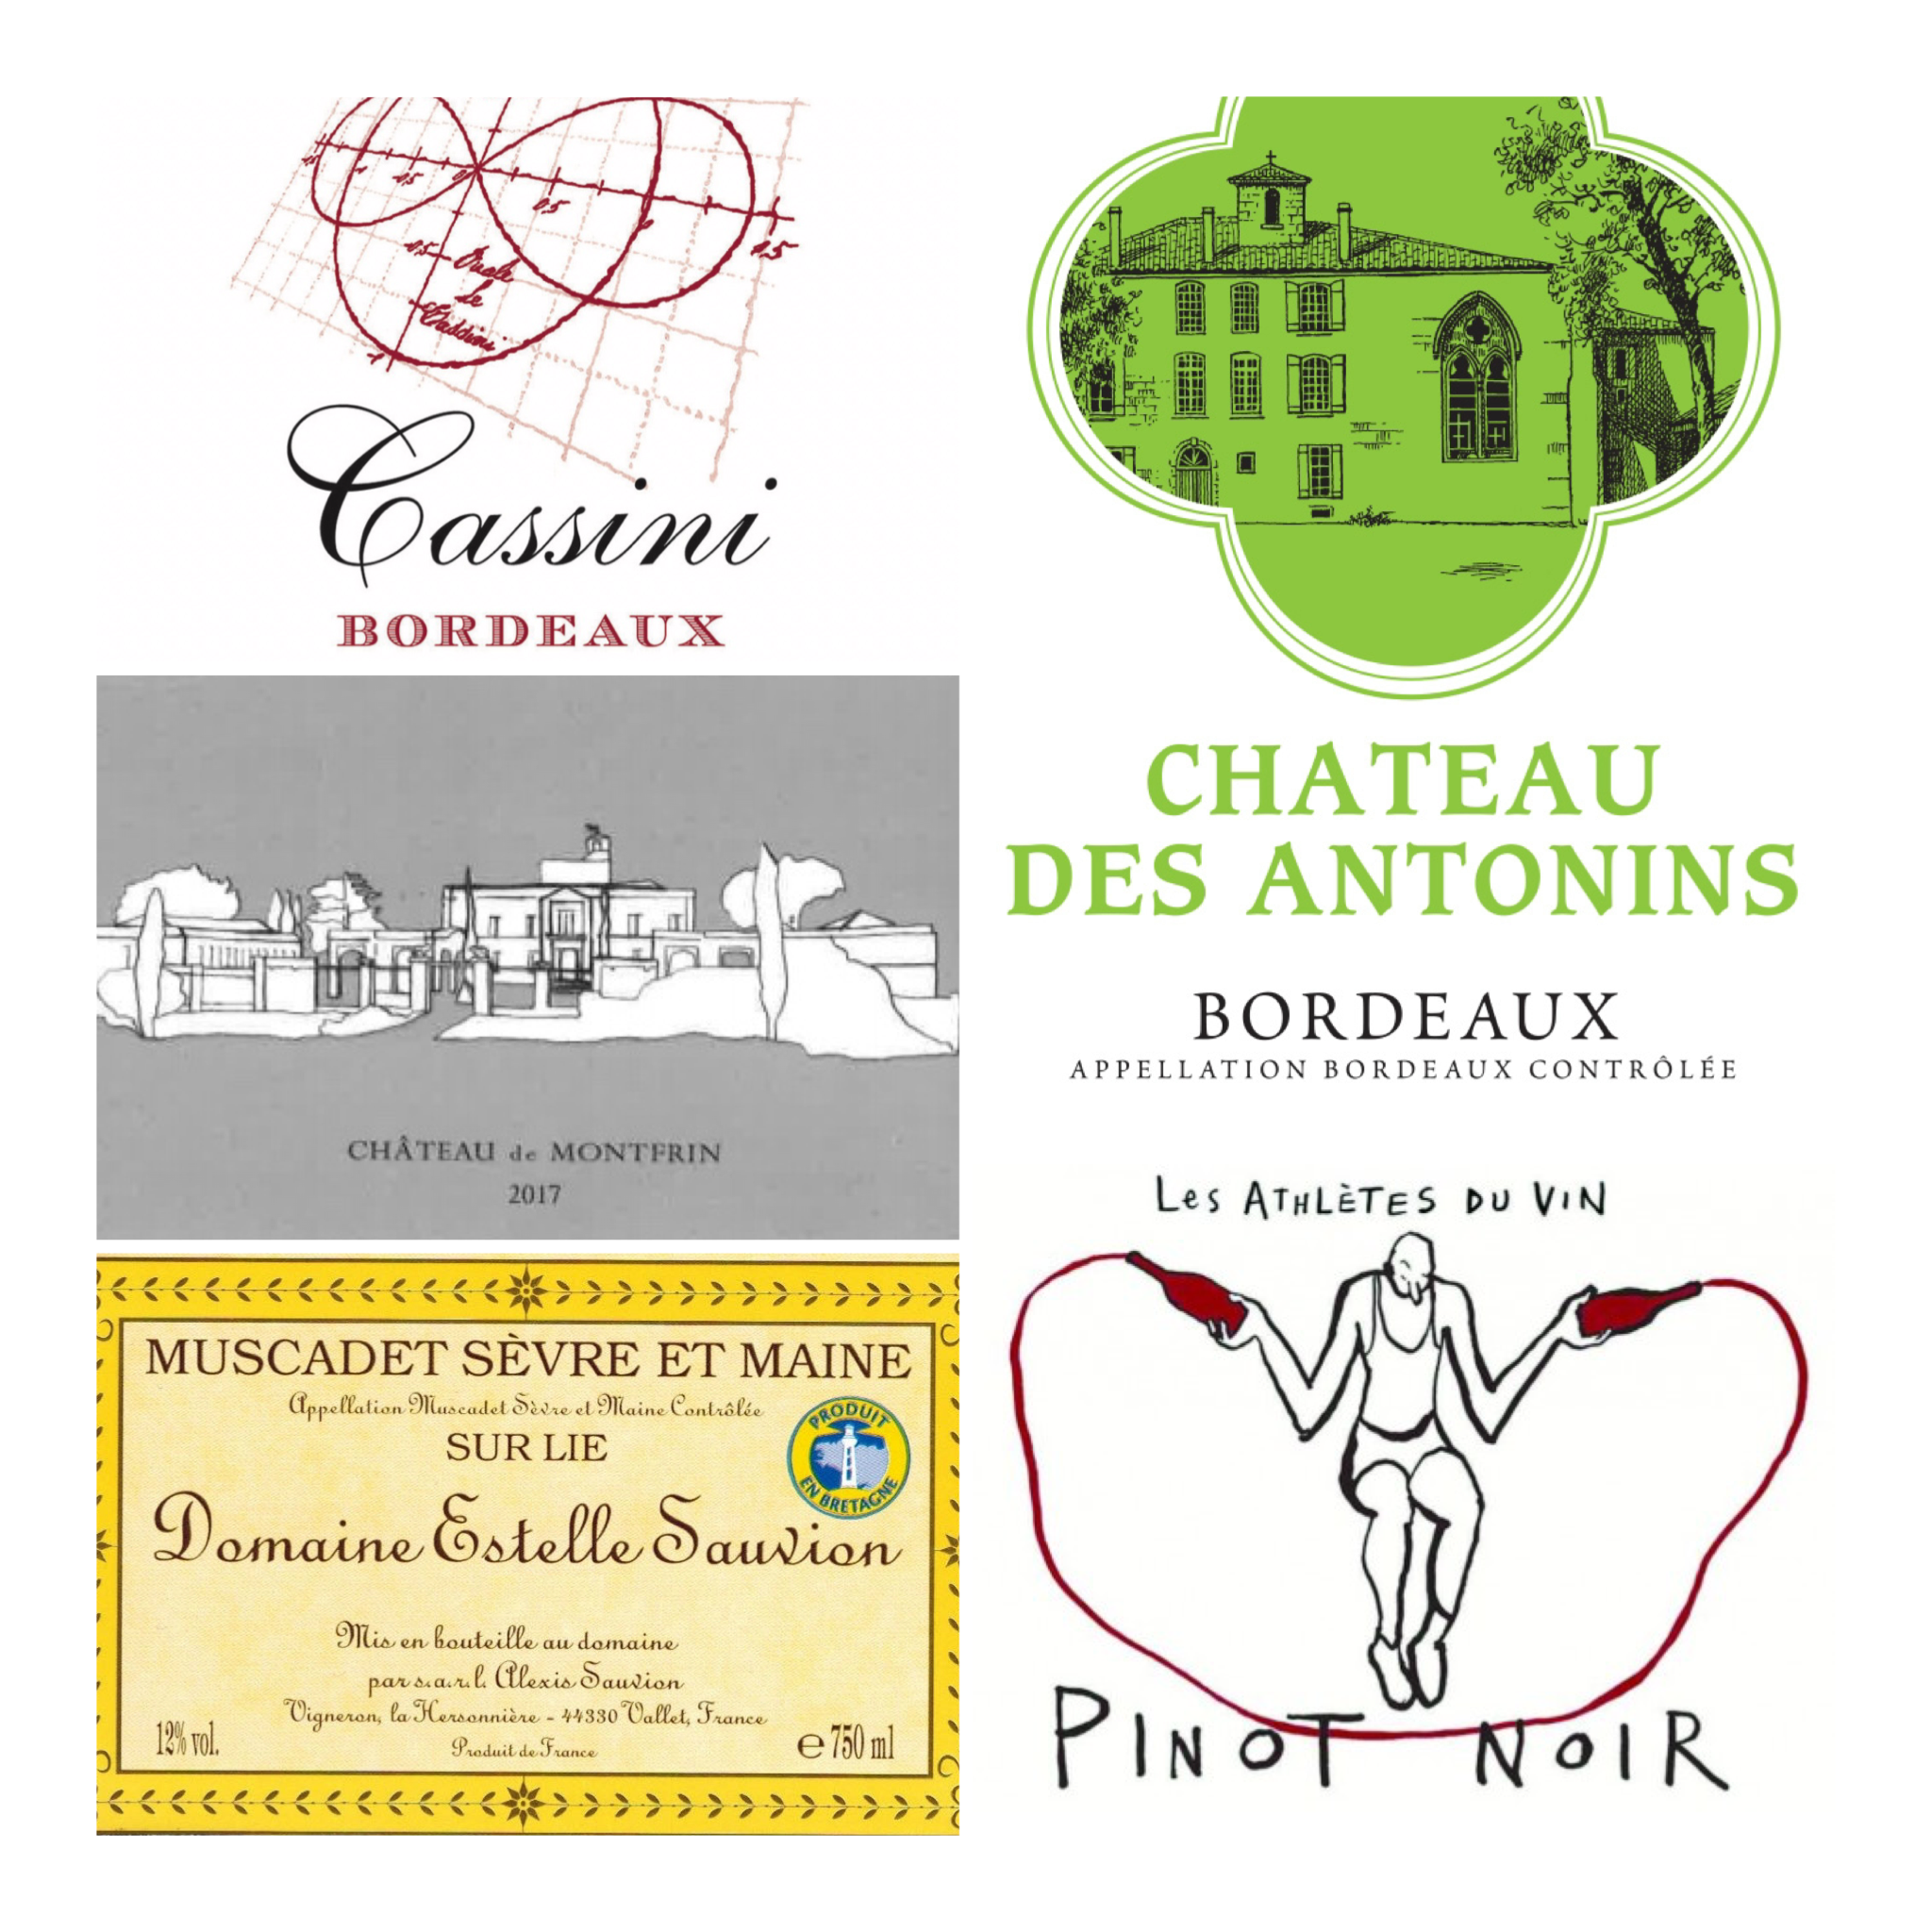 Tour de France Wine Pack - Shipping in November!